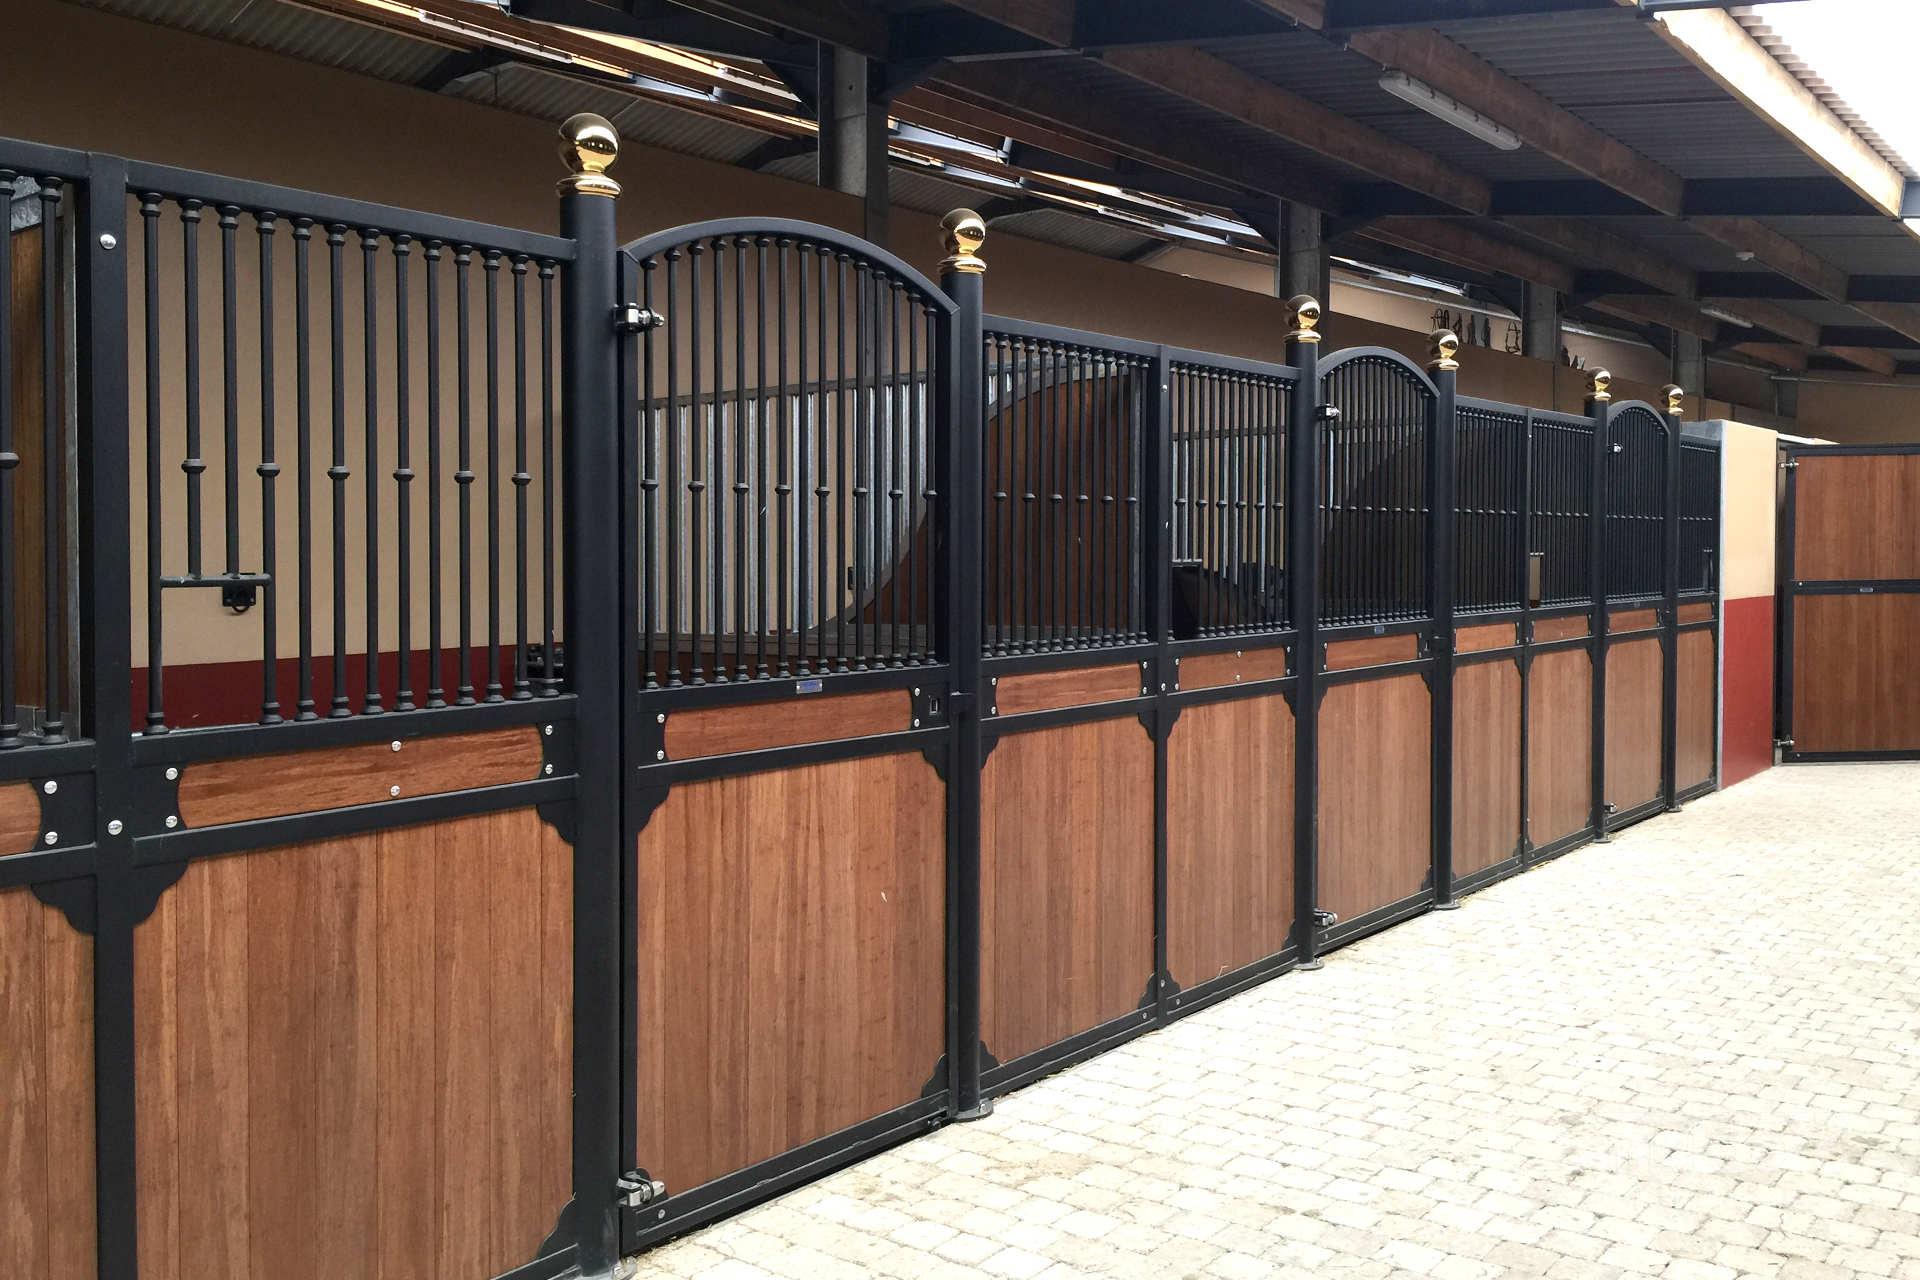 https://www.smulders.pl/wp-content/uploads/2019/03/f004_internal-stables_windsor_doors_windows_barn-doors_PRSH_SMULDERS_PL.jpg